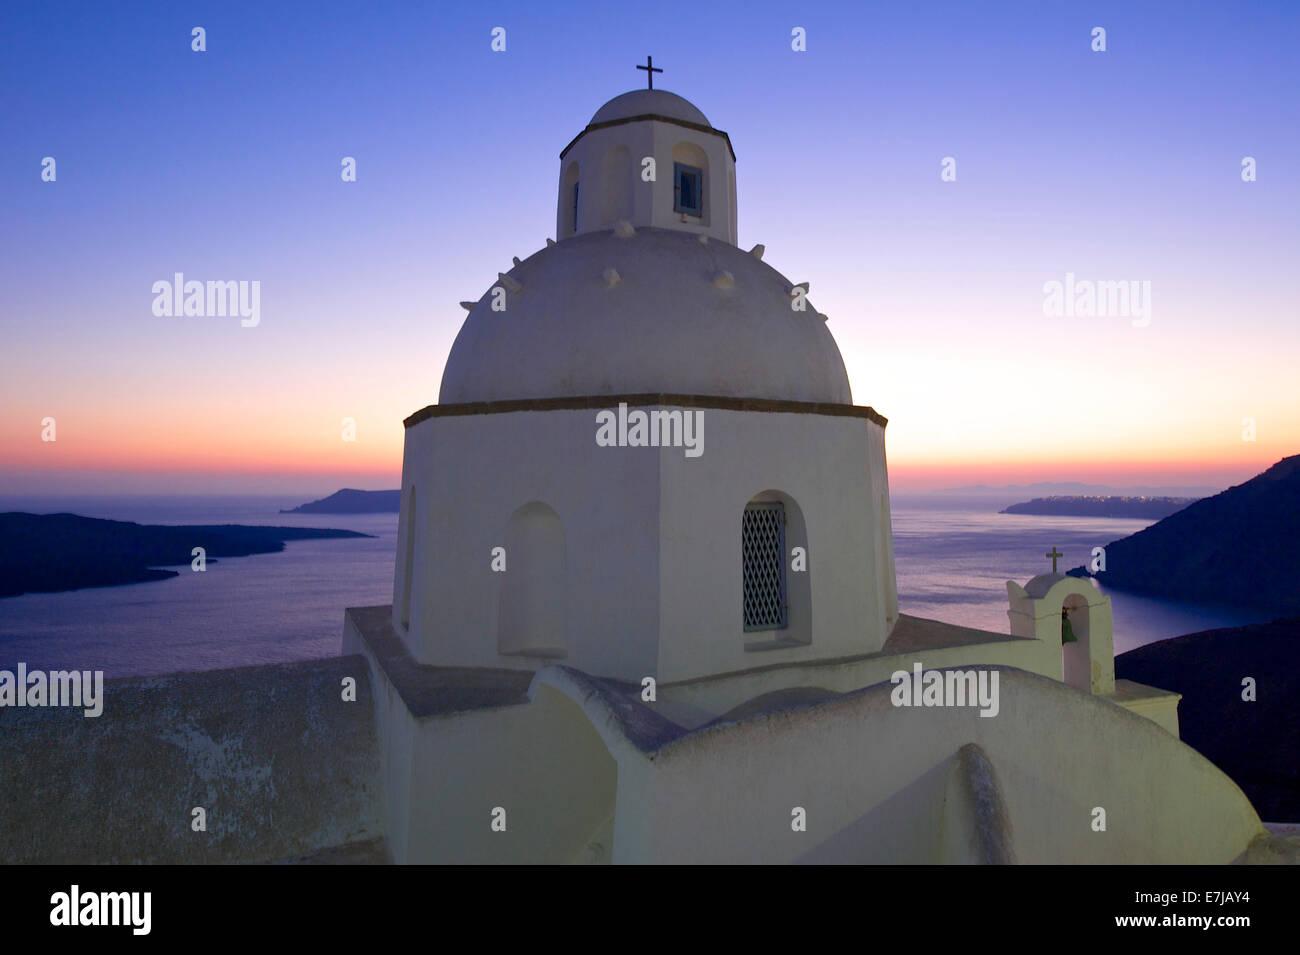 Agios Minas Church am Sonnenuntergang, Thira, Santorini, Kykladen, Griechenland Stockbild